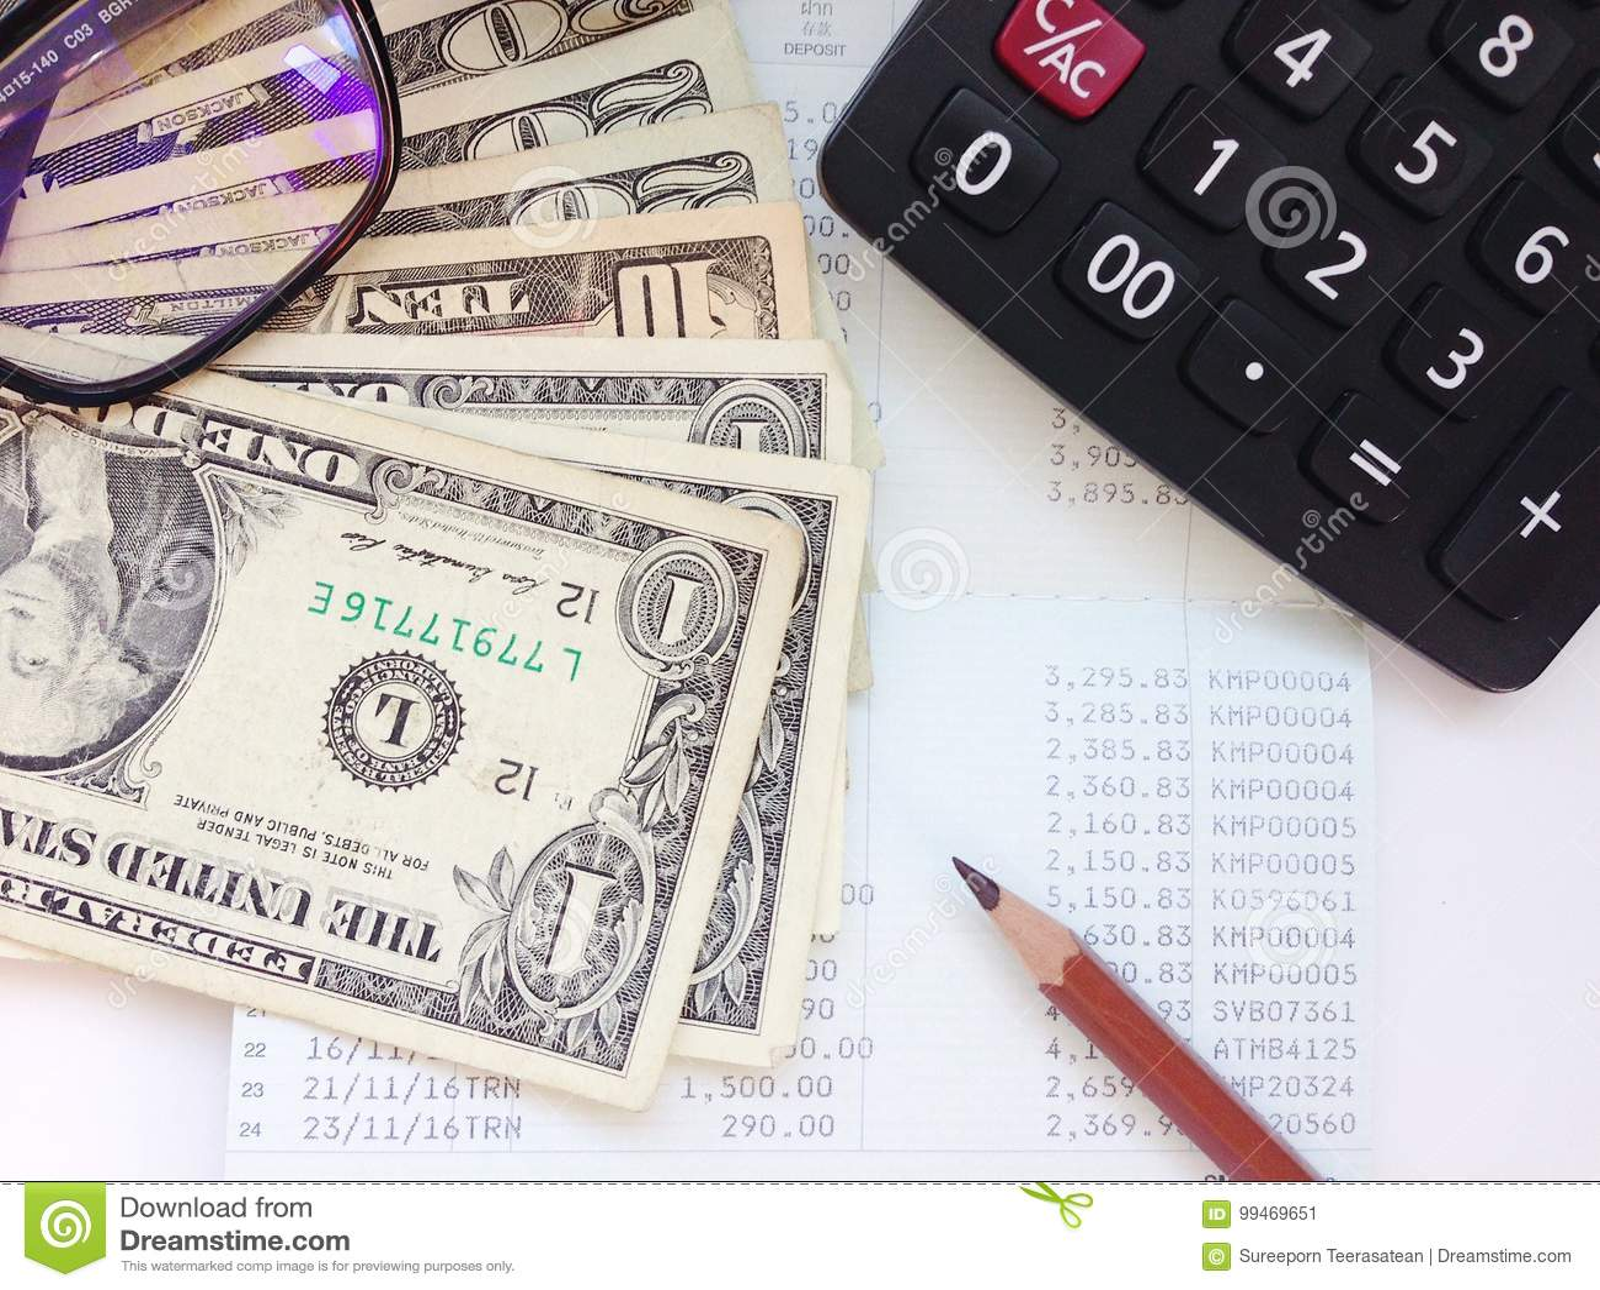 Trn currency